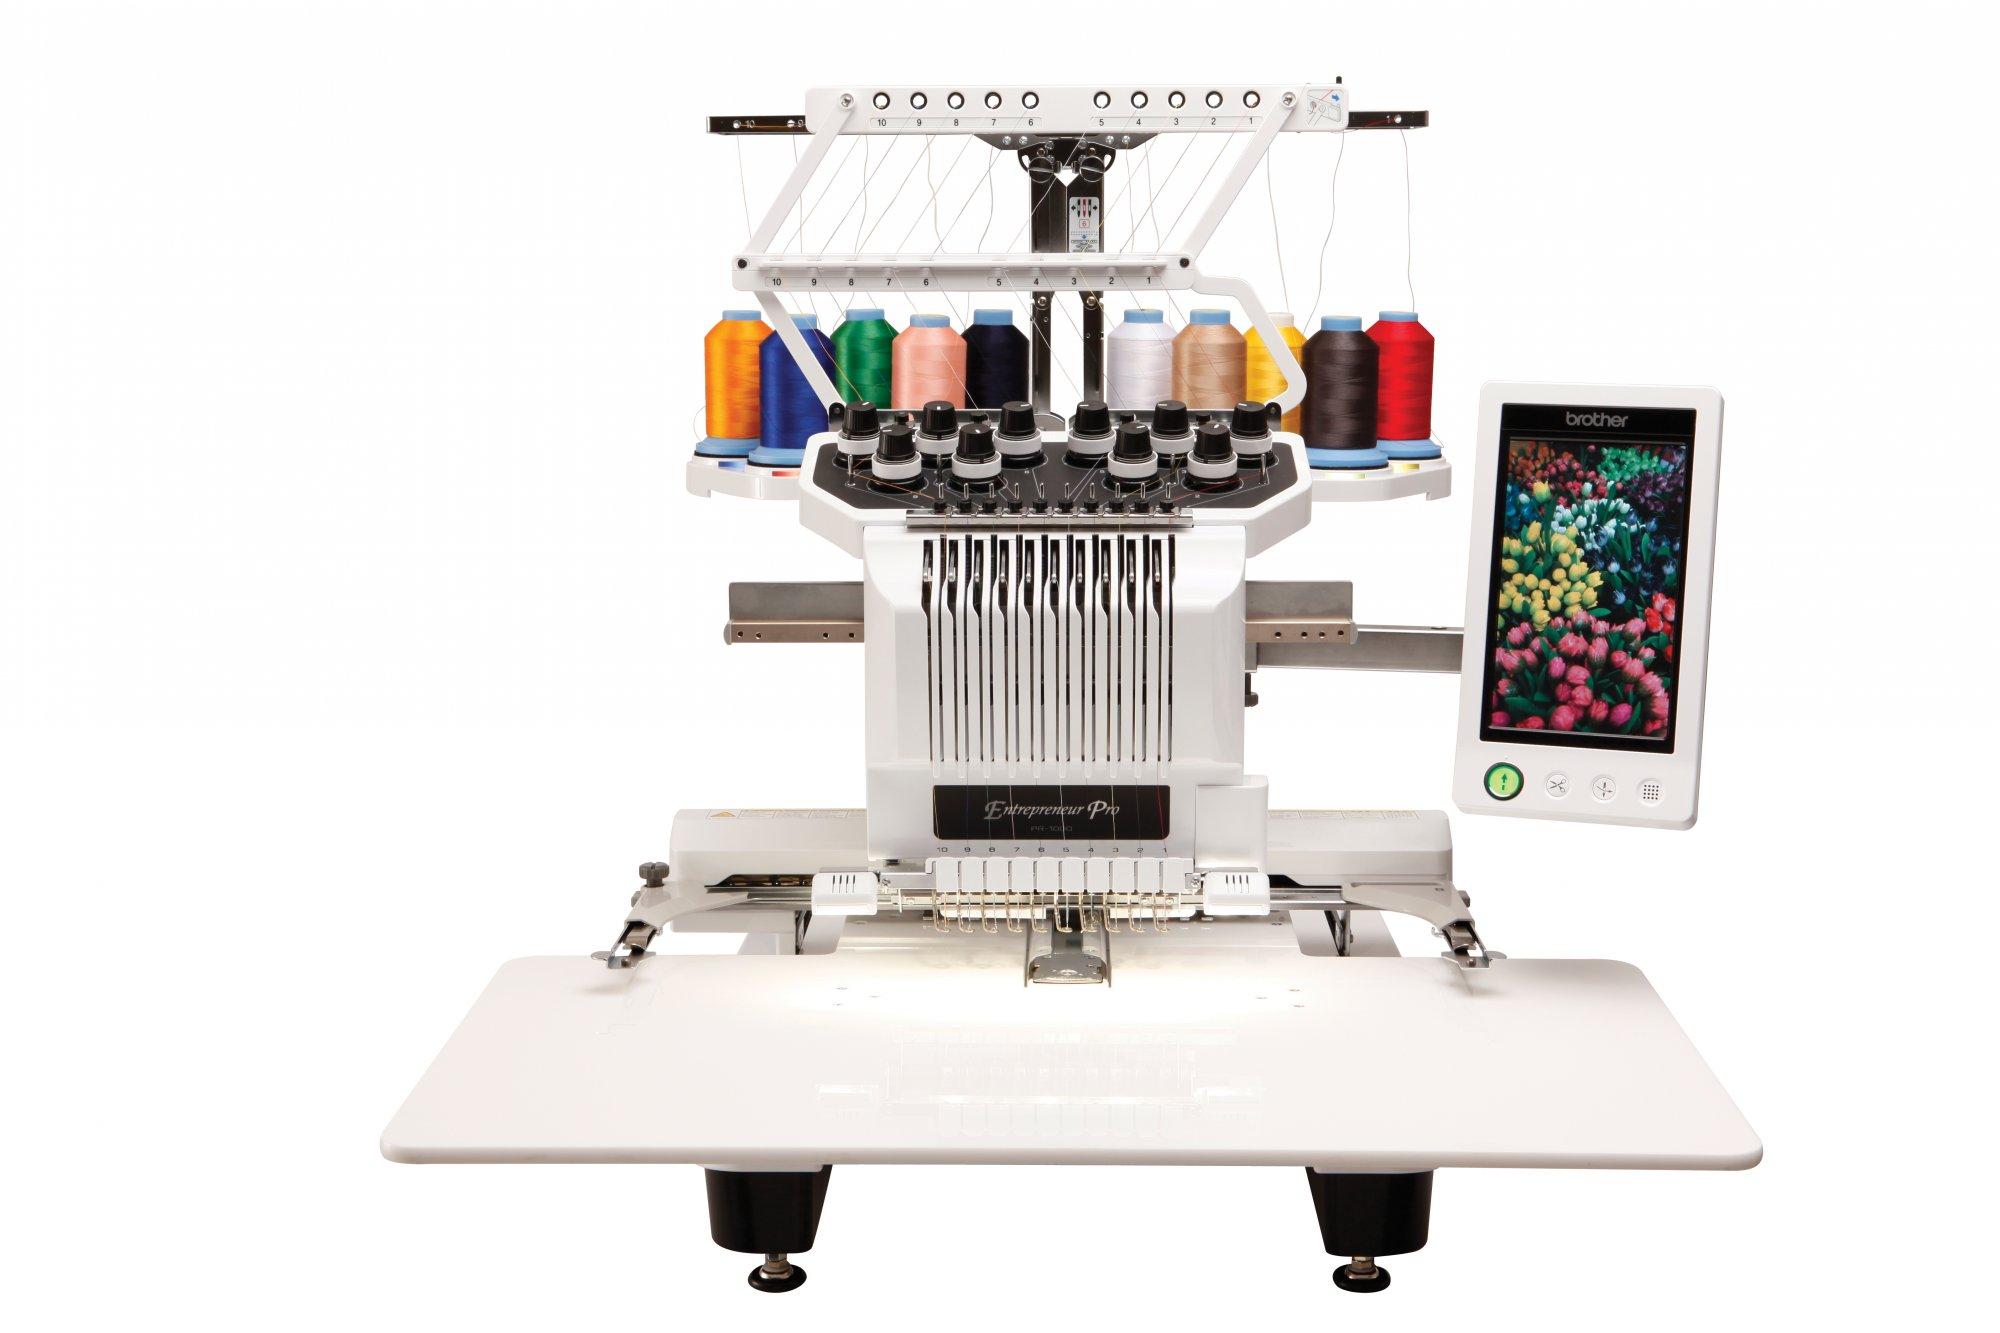 pr 1000 embroidery machine